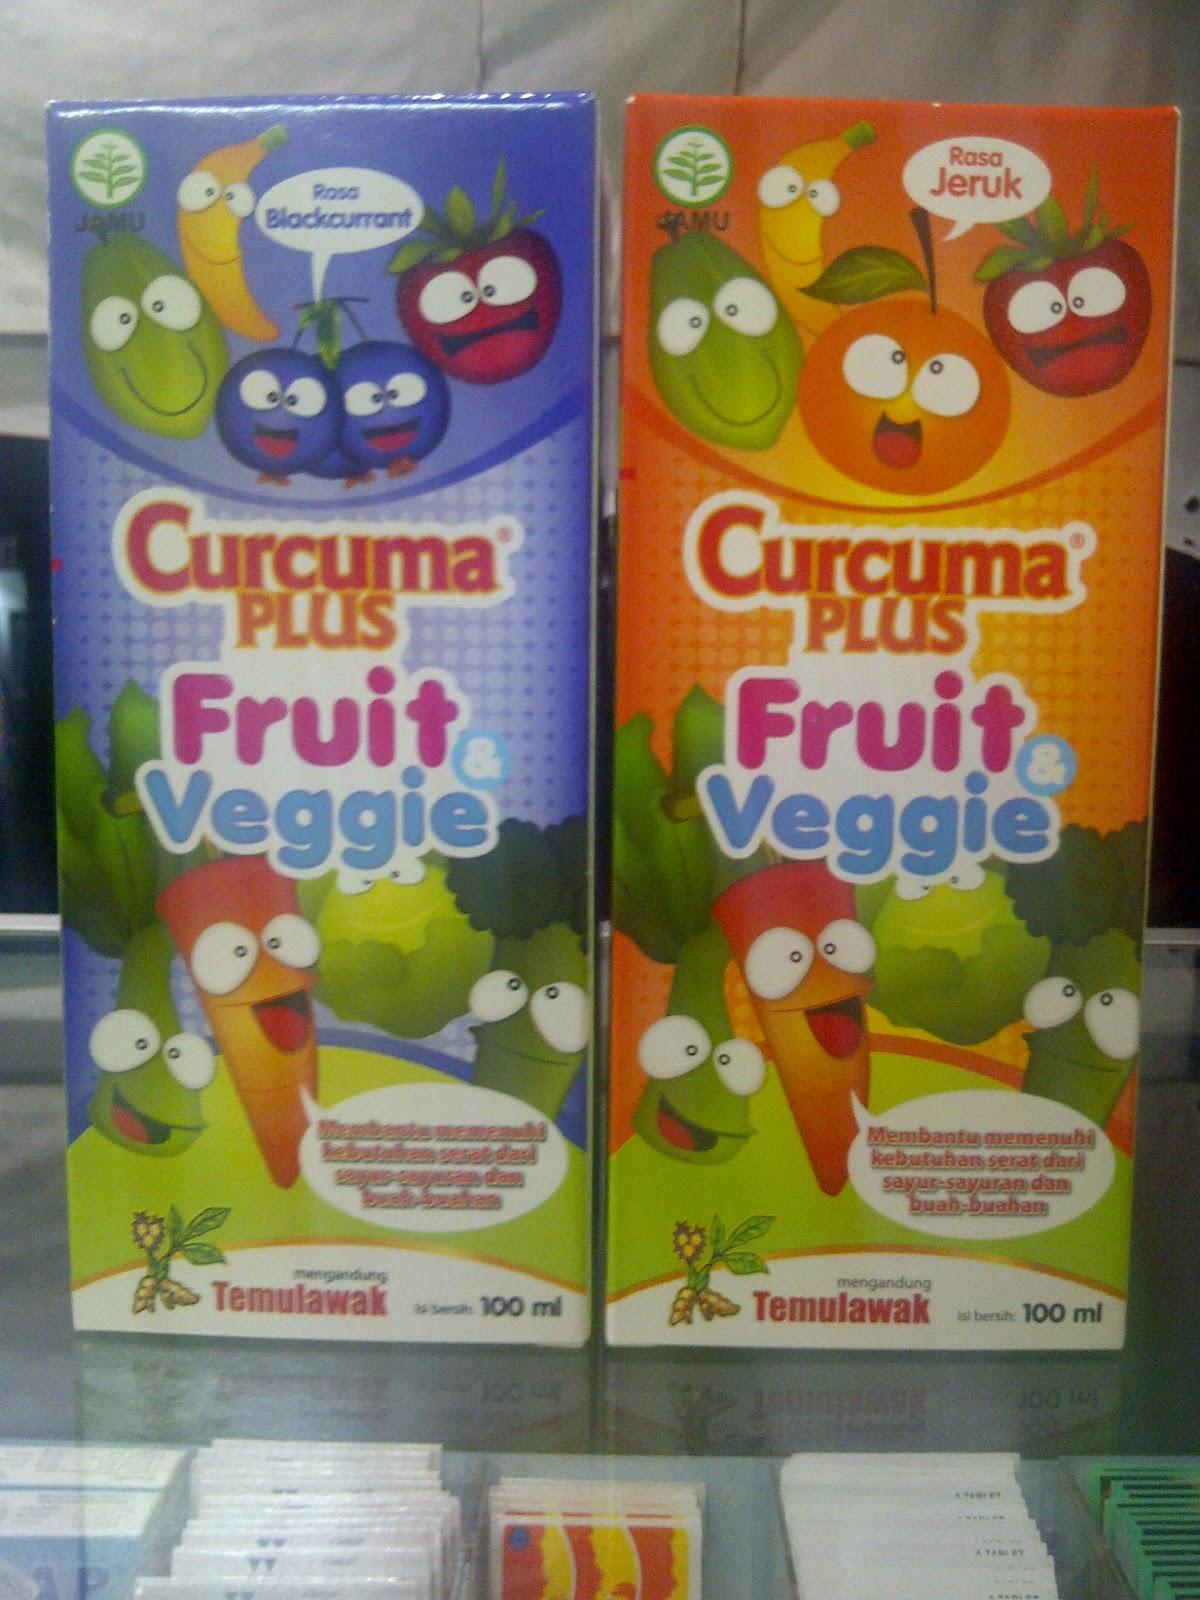 Toko Obat Jumatta Curcuma Rmulsion Blackcurrant Flavour Plus Fruitveggie 100ml Blackcurrent Rp 22000 Jeruk